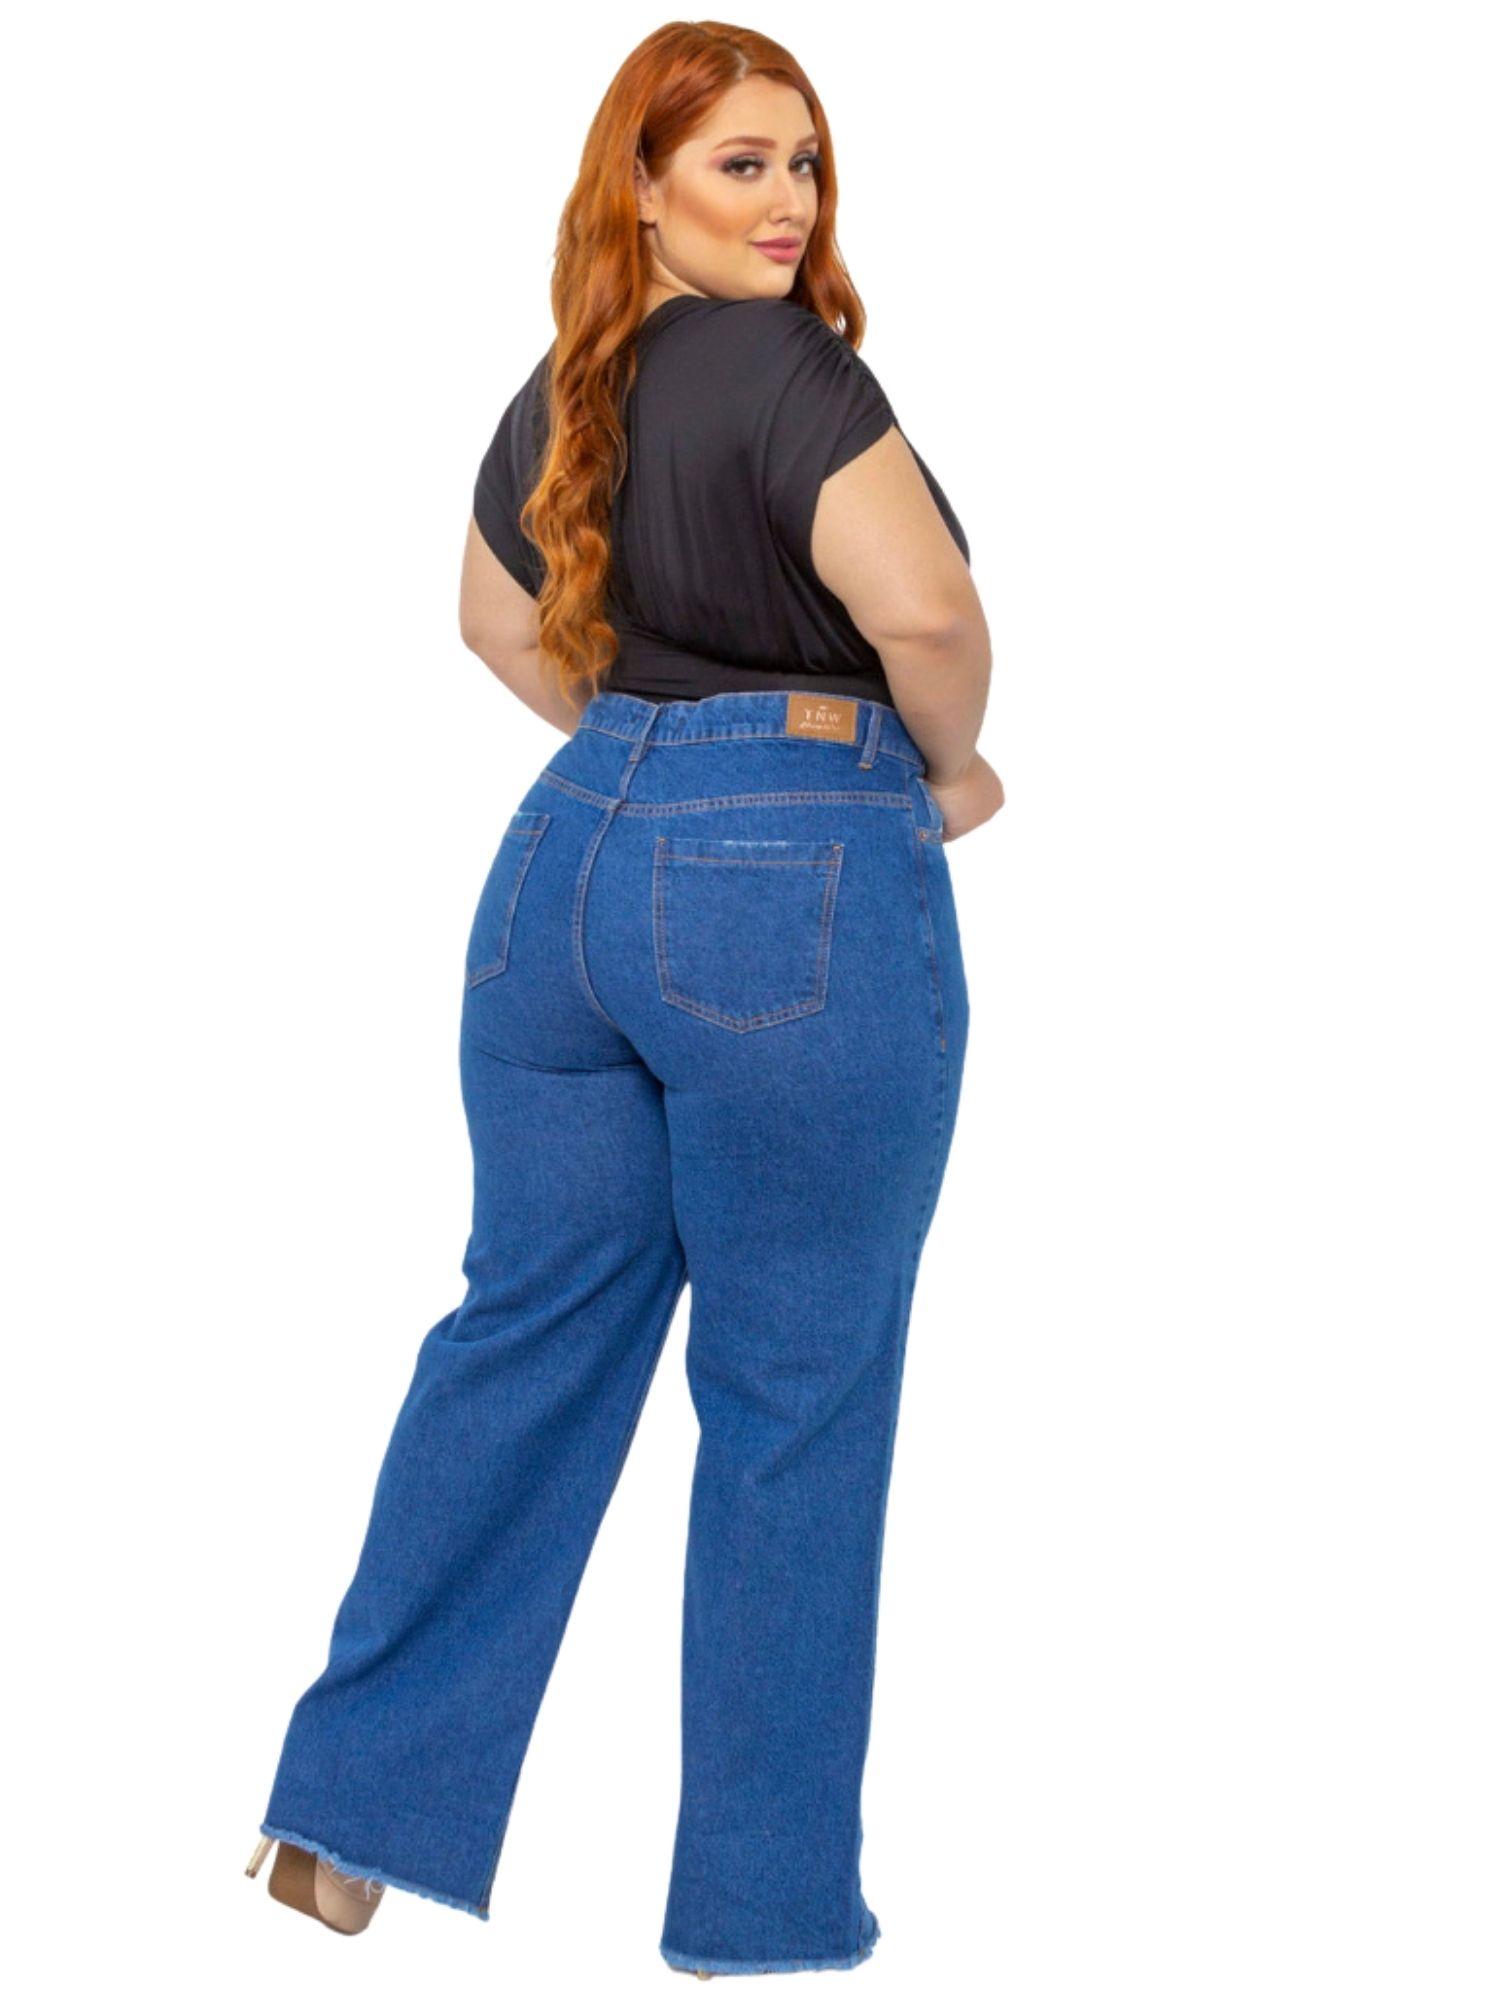 Calça Feminina Wide Leg Plus Size Tnw Jeans 30104